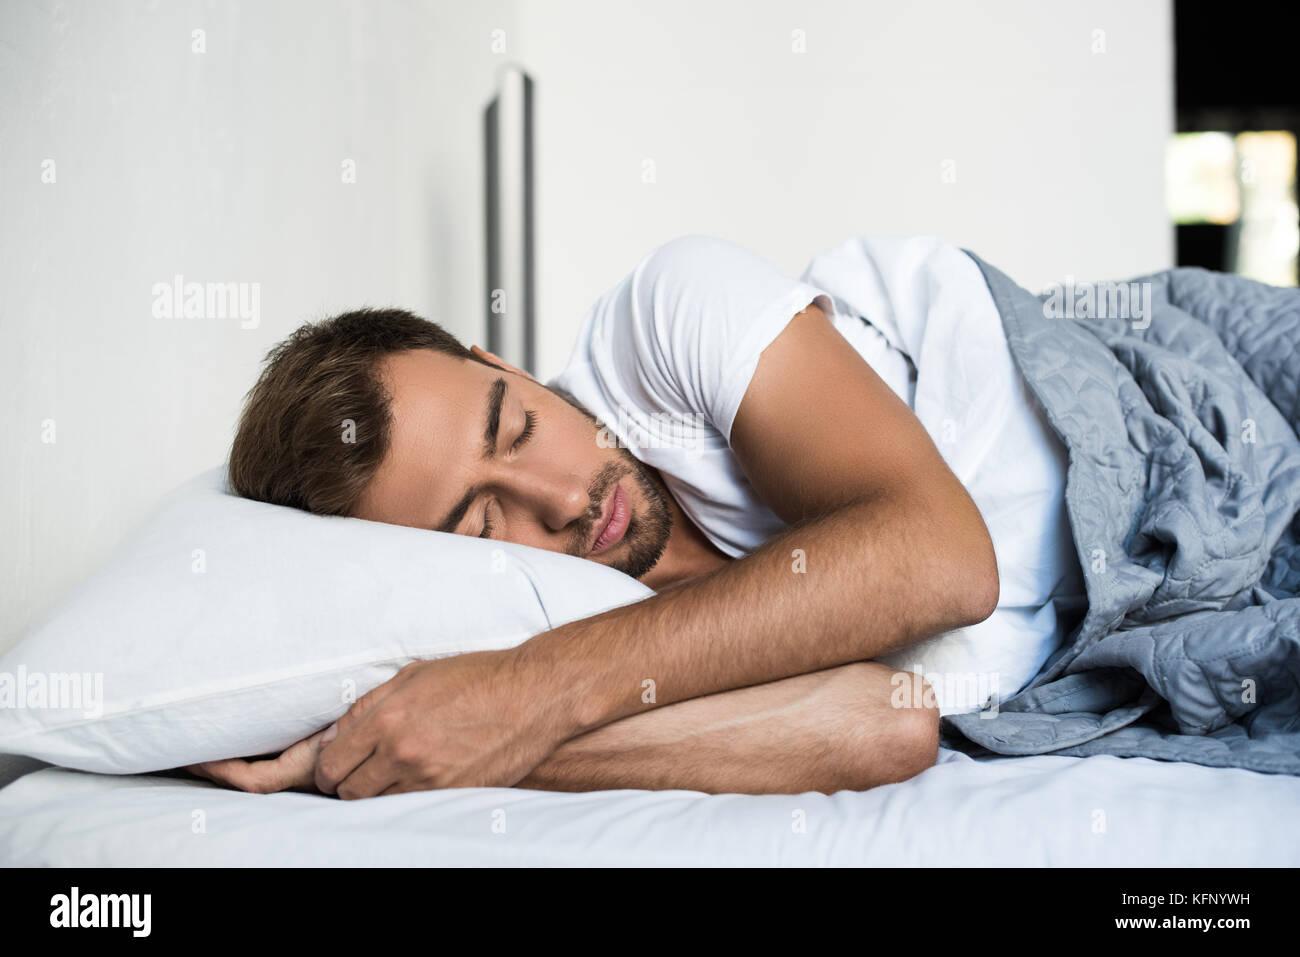 Mann schlafen im Bett Stockbild